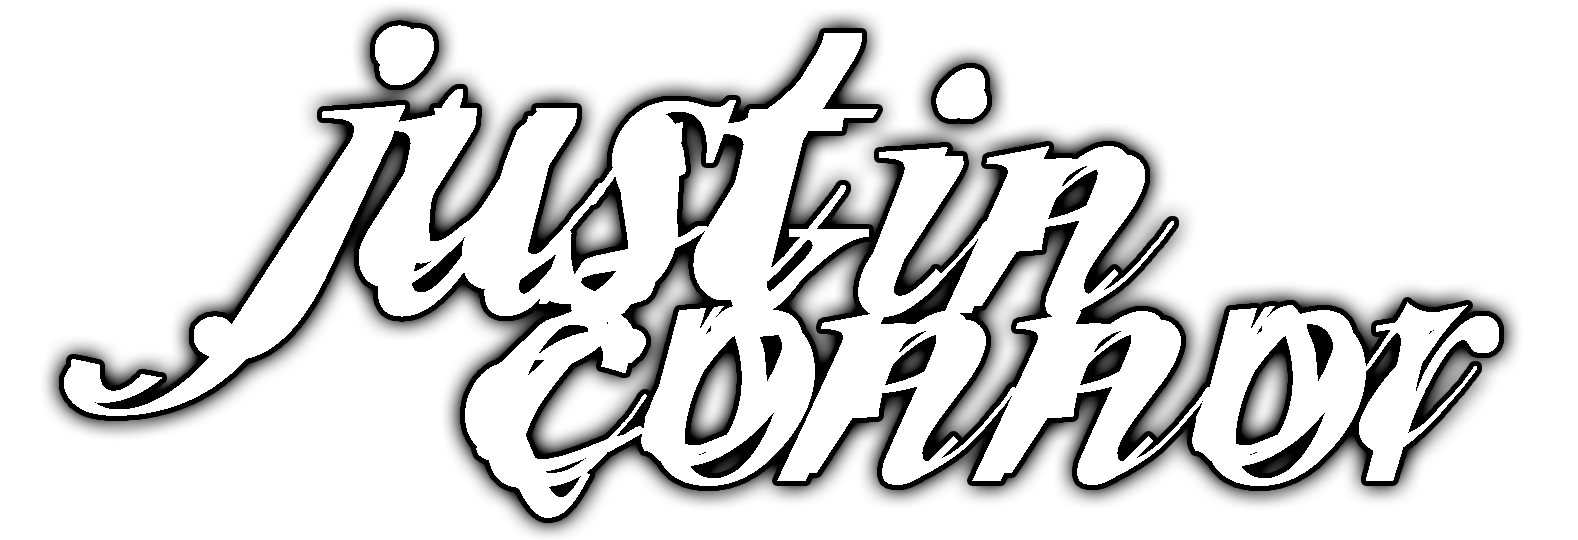 Justin Connor